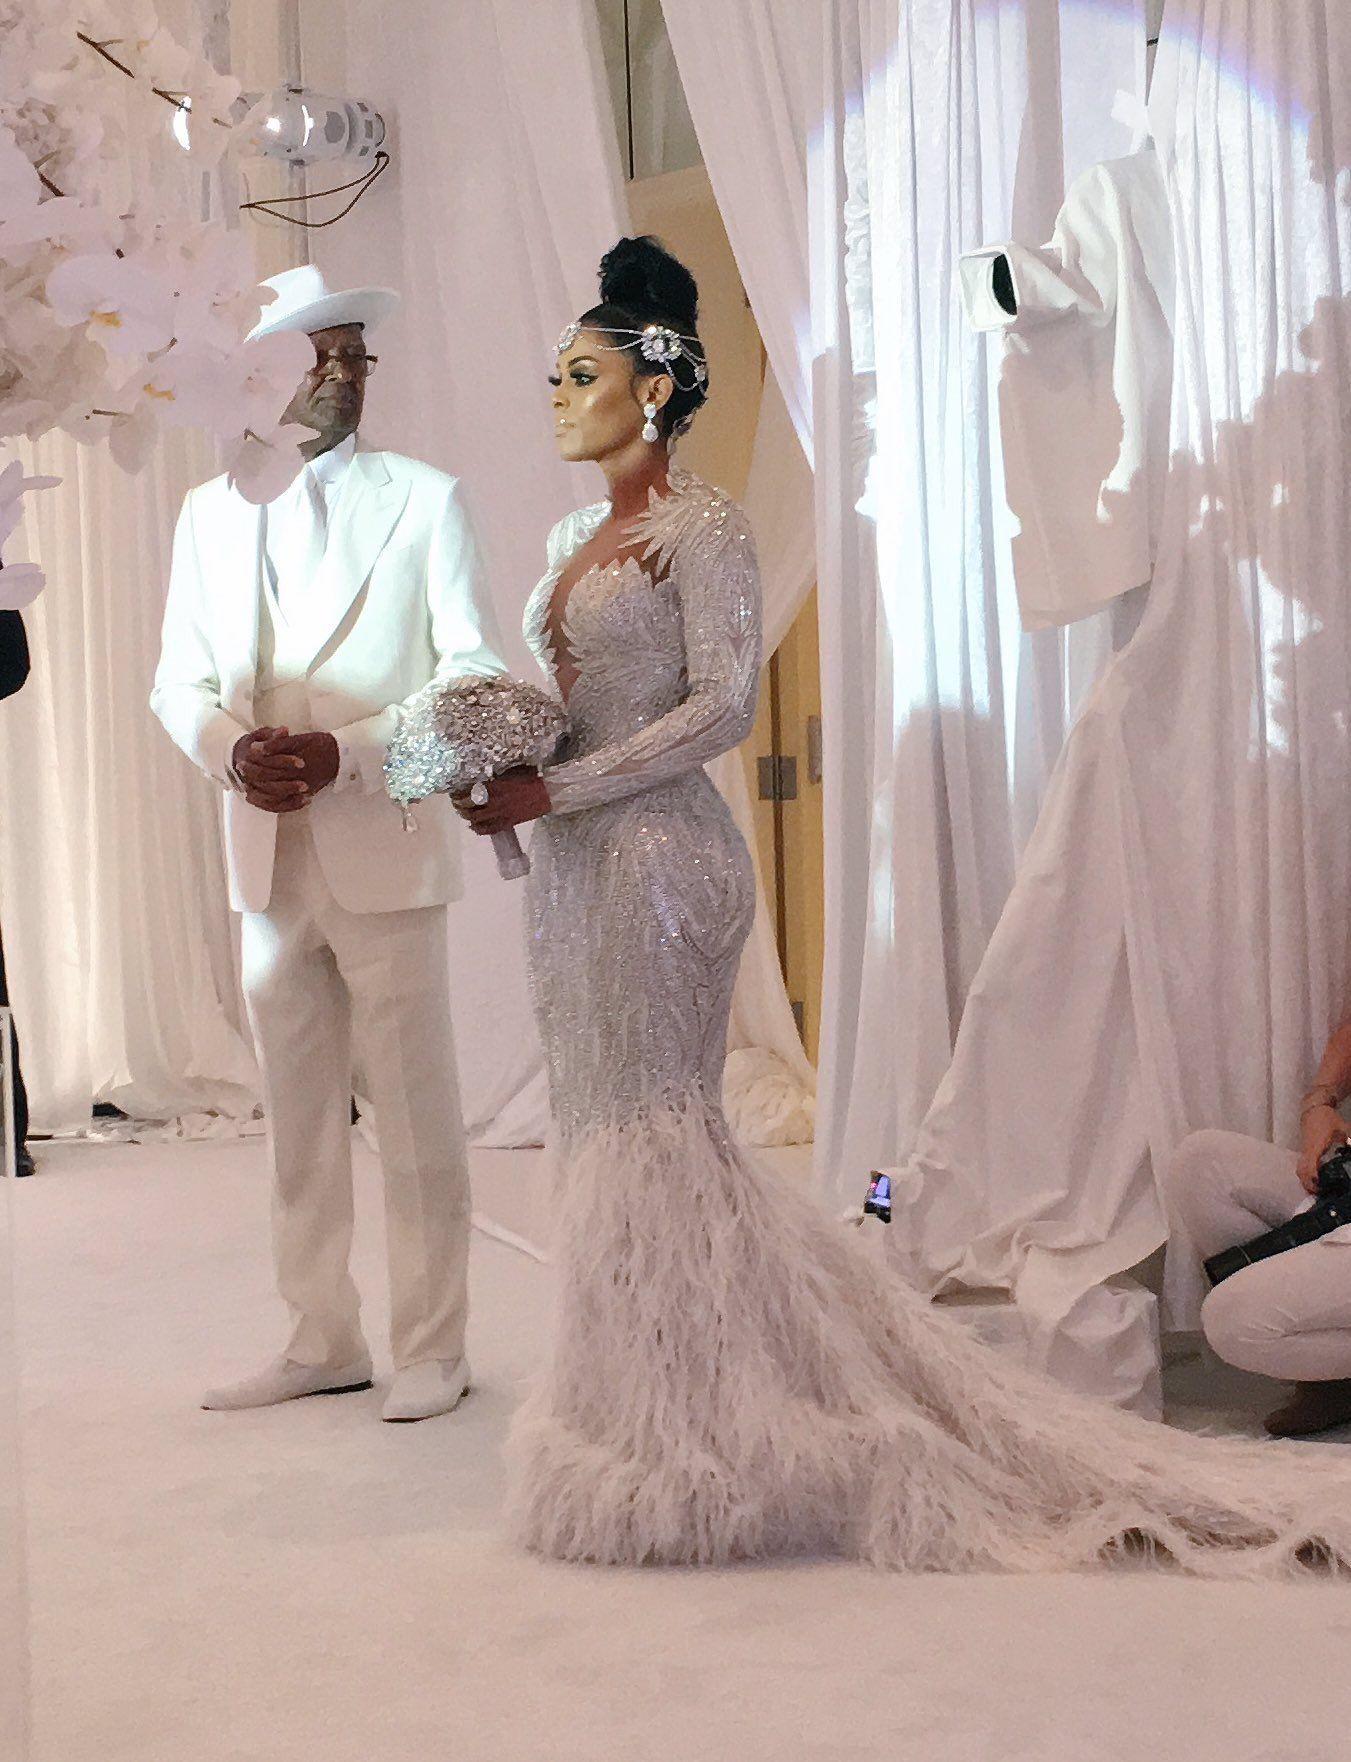 Gucci mane wife wedding dress  Pin by Gracia Mukendi on Kleding bruiloft  Pinterest  Wedding